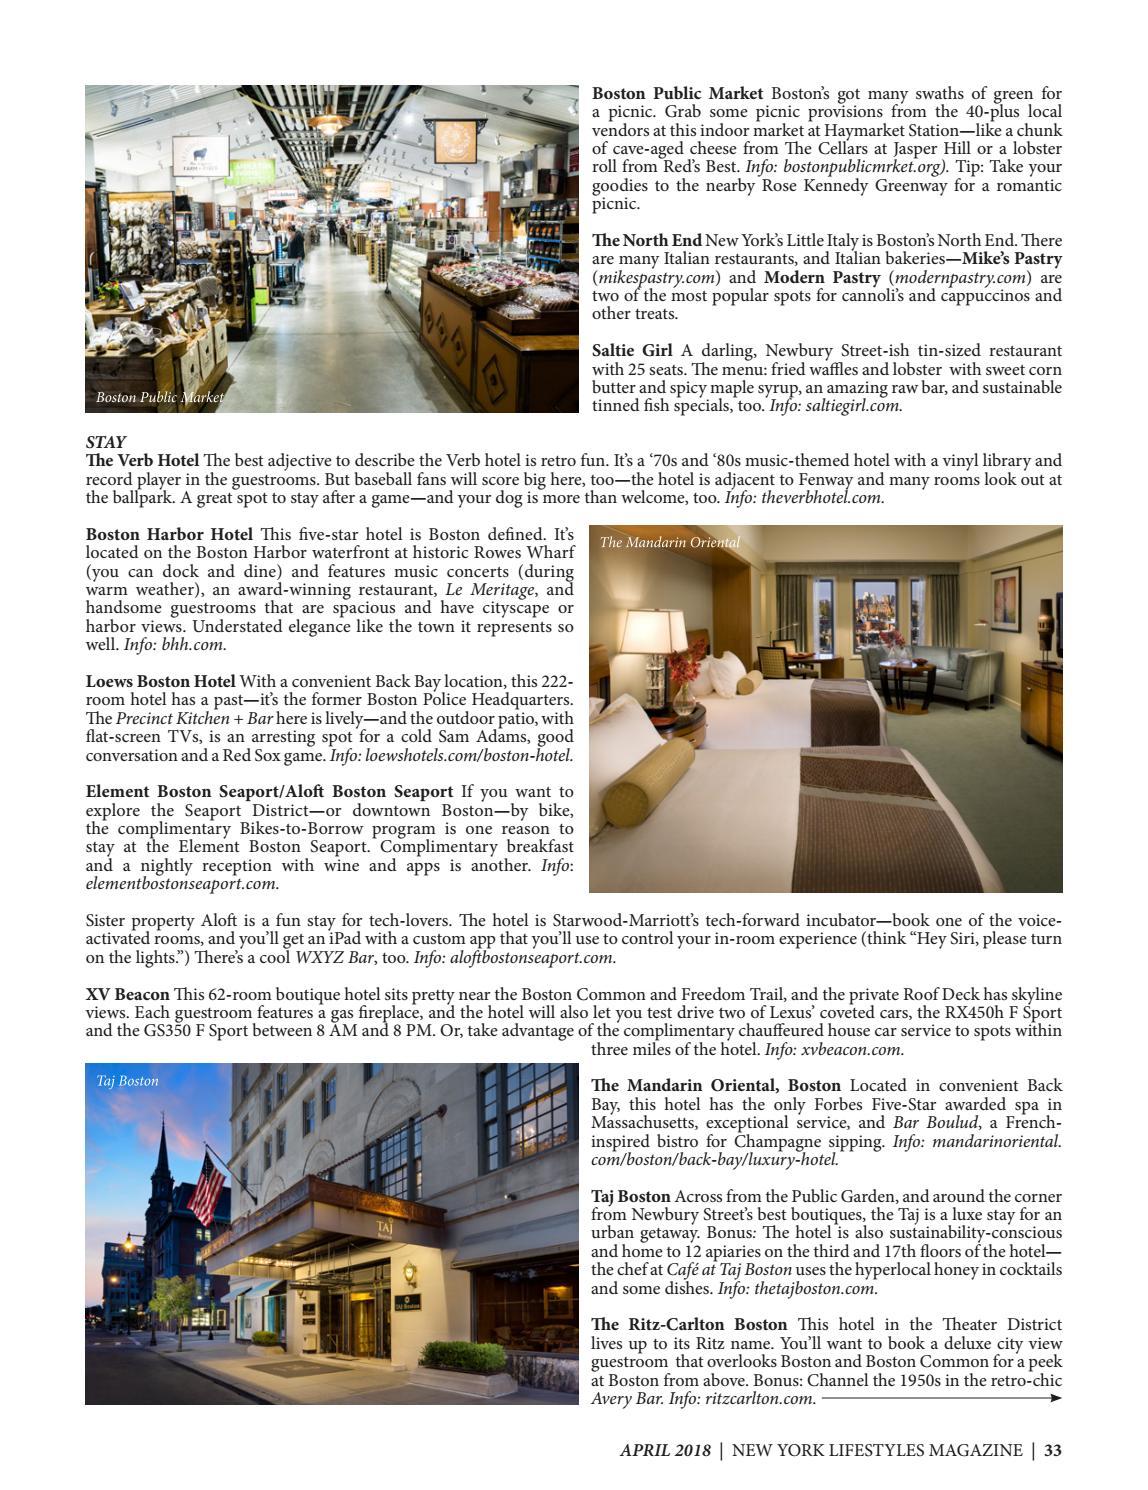 New York Lifestyles Magazine - April 2018